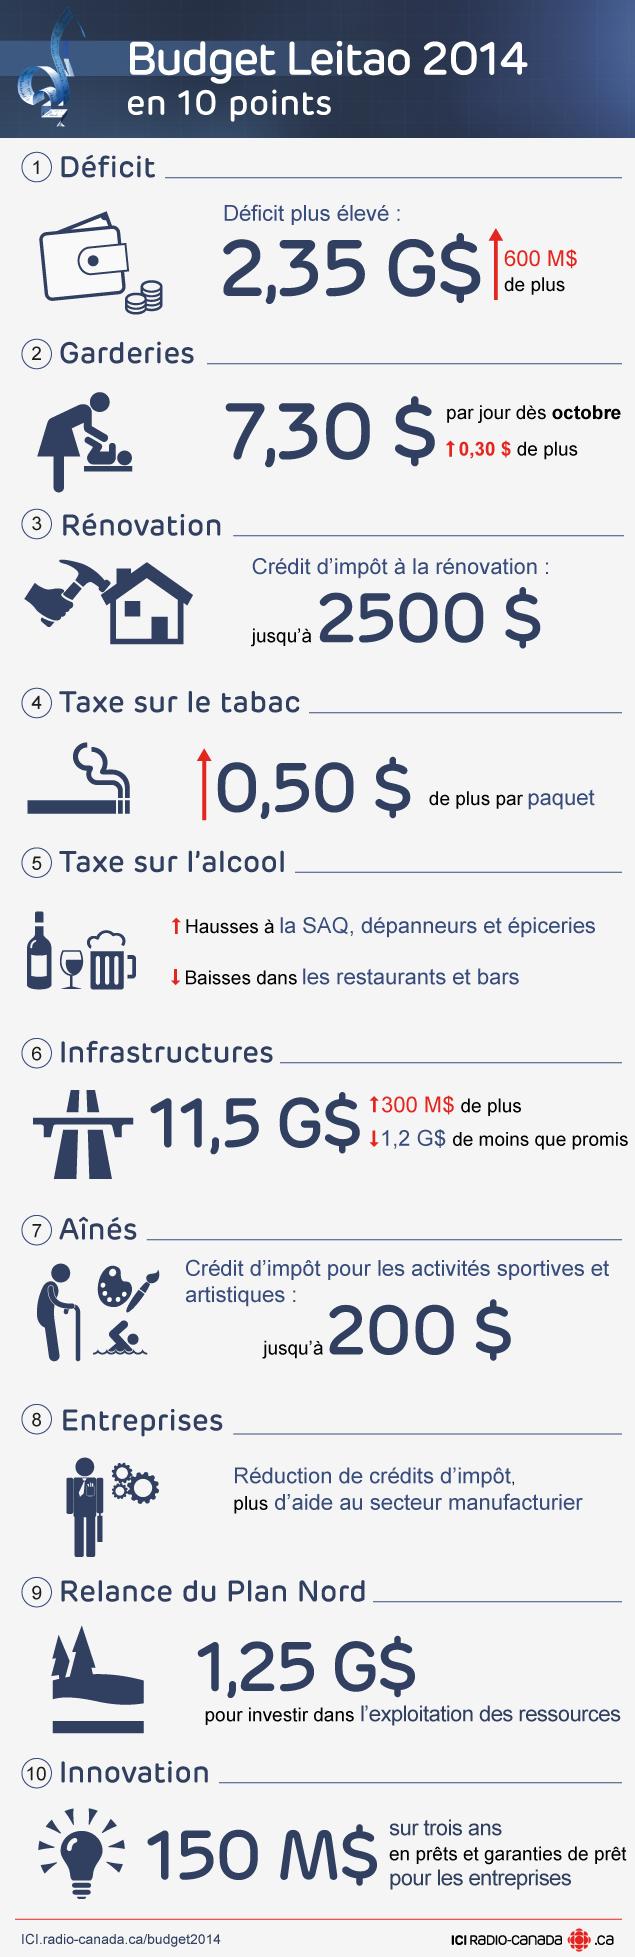 Budget Leitao 2014 en 10 mesures